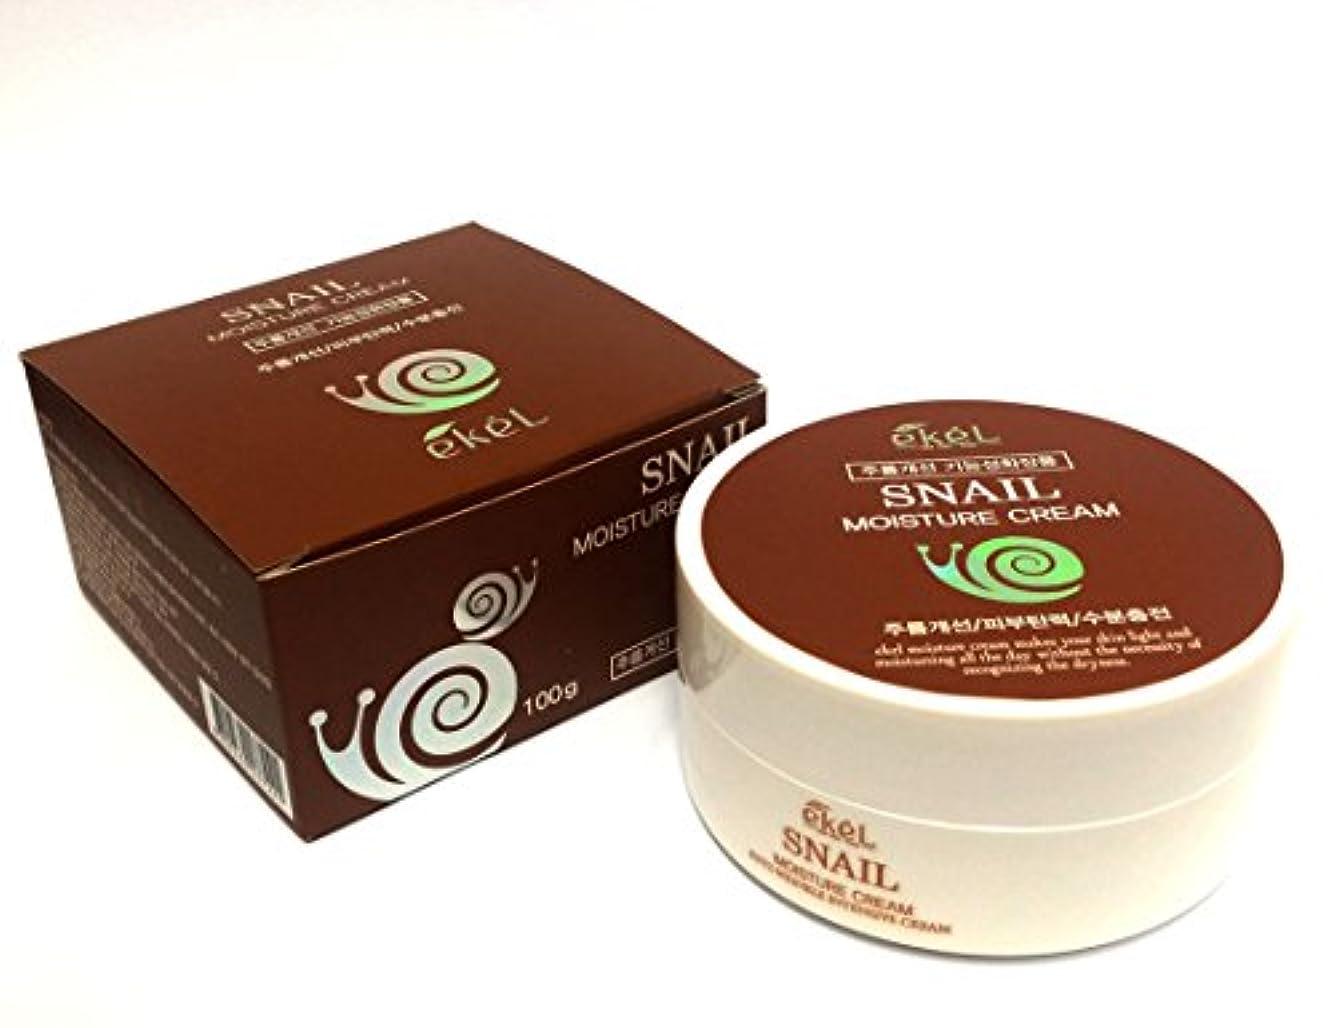 [ekel] スネイルモイスチャークリーム100g / Snail Moisture Cream 100g /しわ?弾力?保湿 / Wrinkle, elasticity, Moisturizing / 韓国化粧品 /...